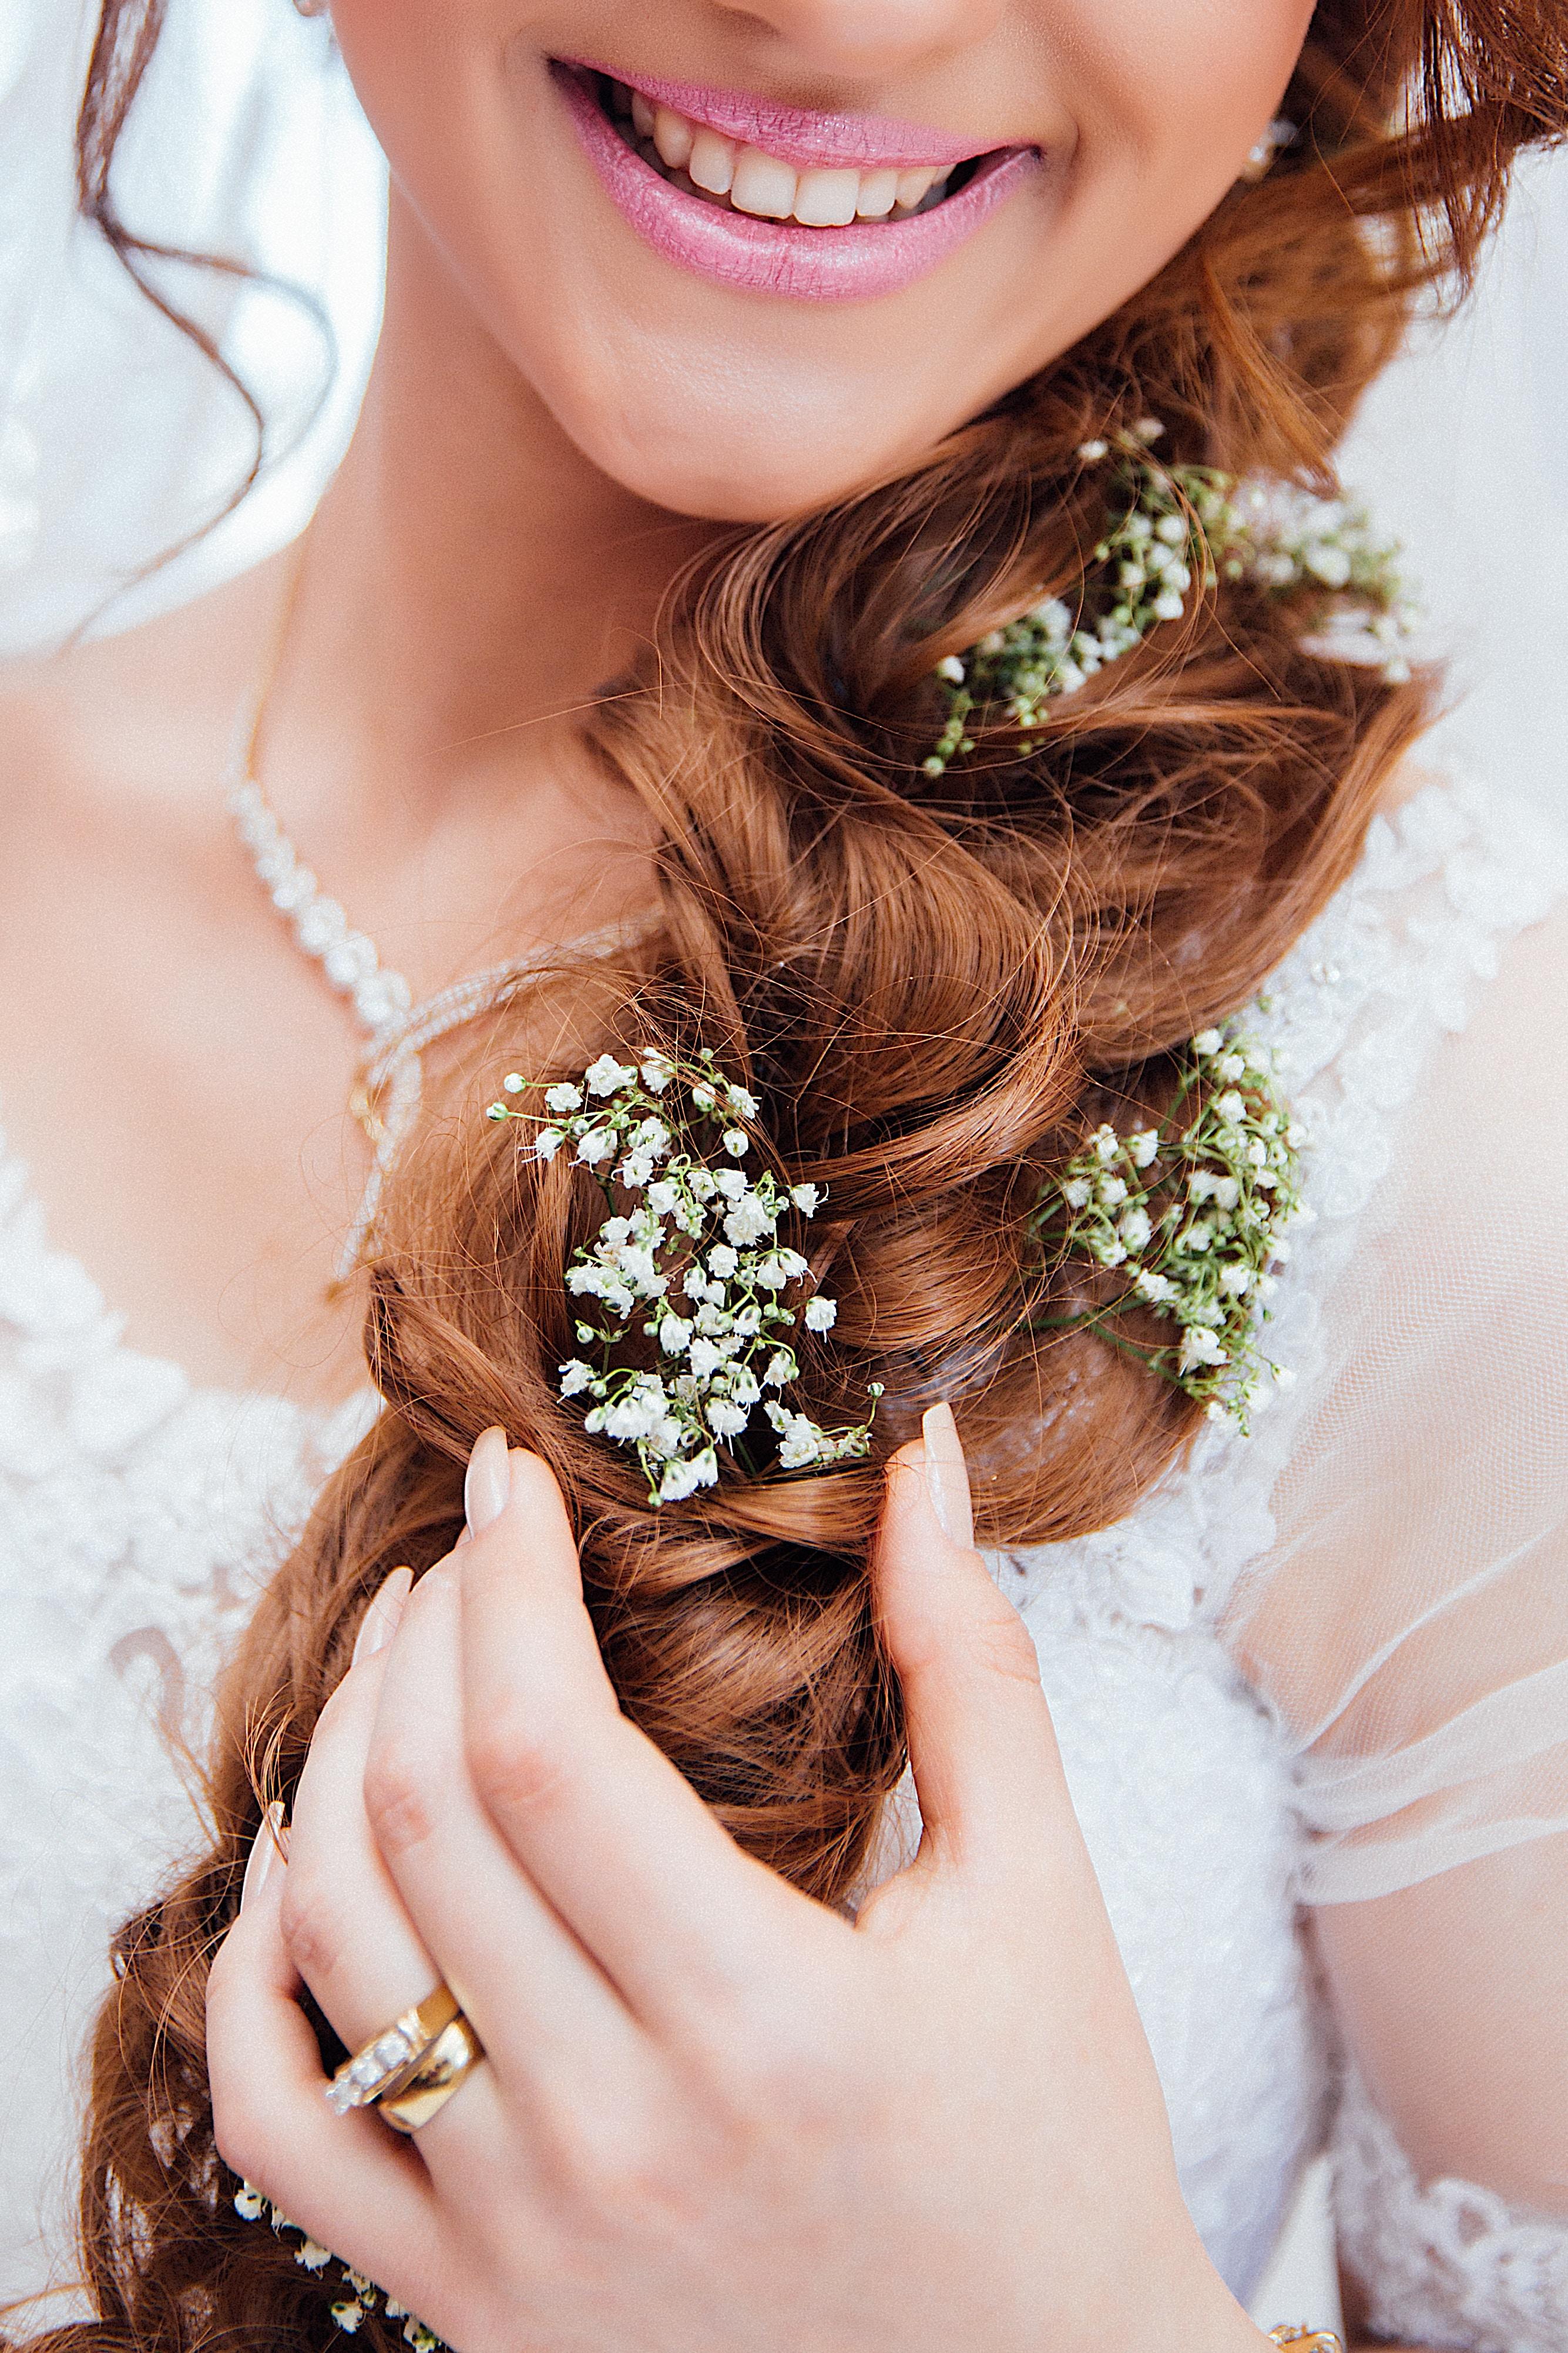 Coafuri De Nunta 2018 Tot Ce Trebuie Sa Stii Wedding Consulting